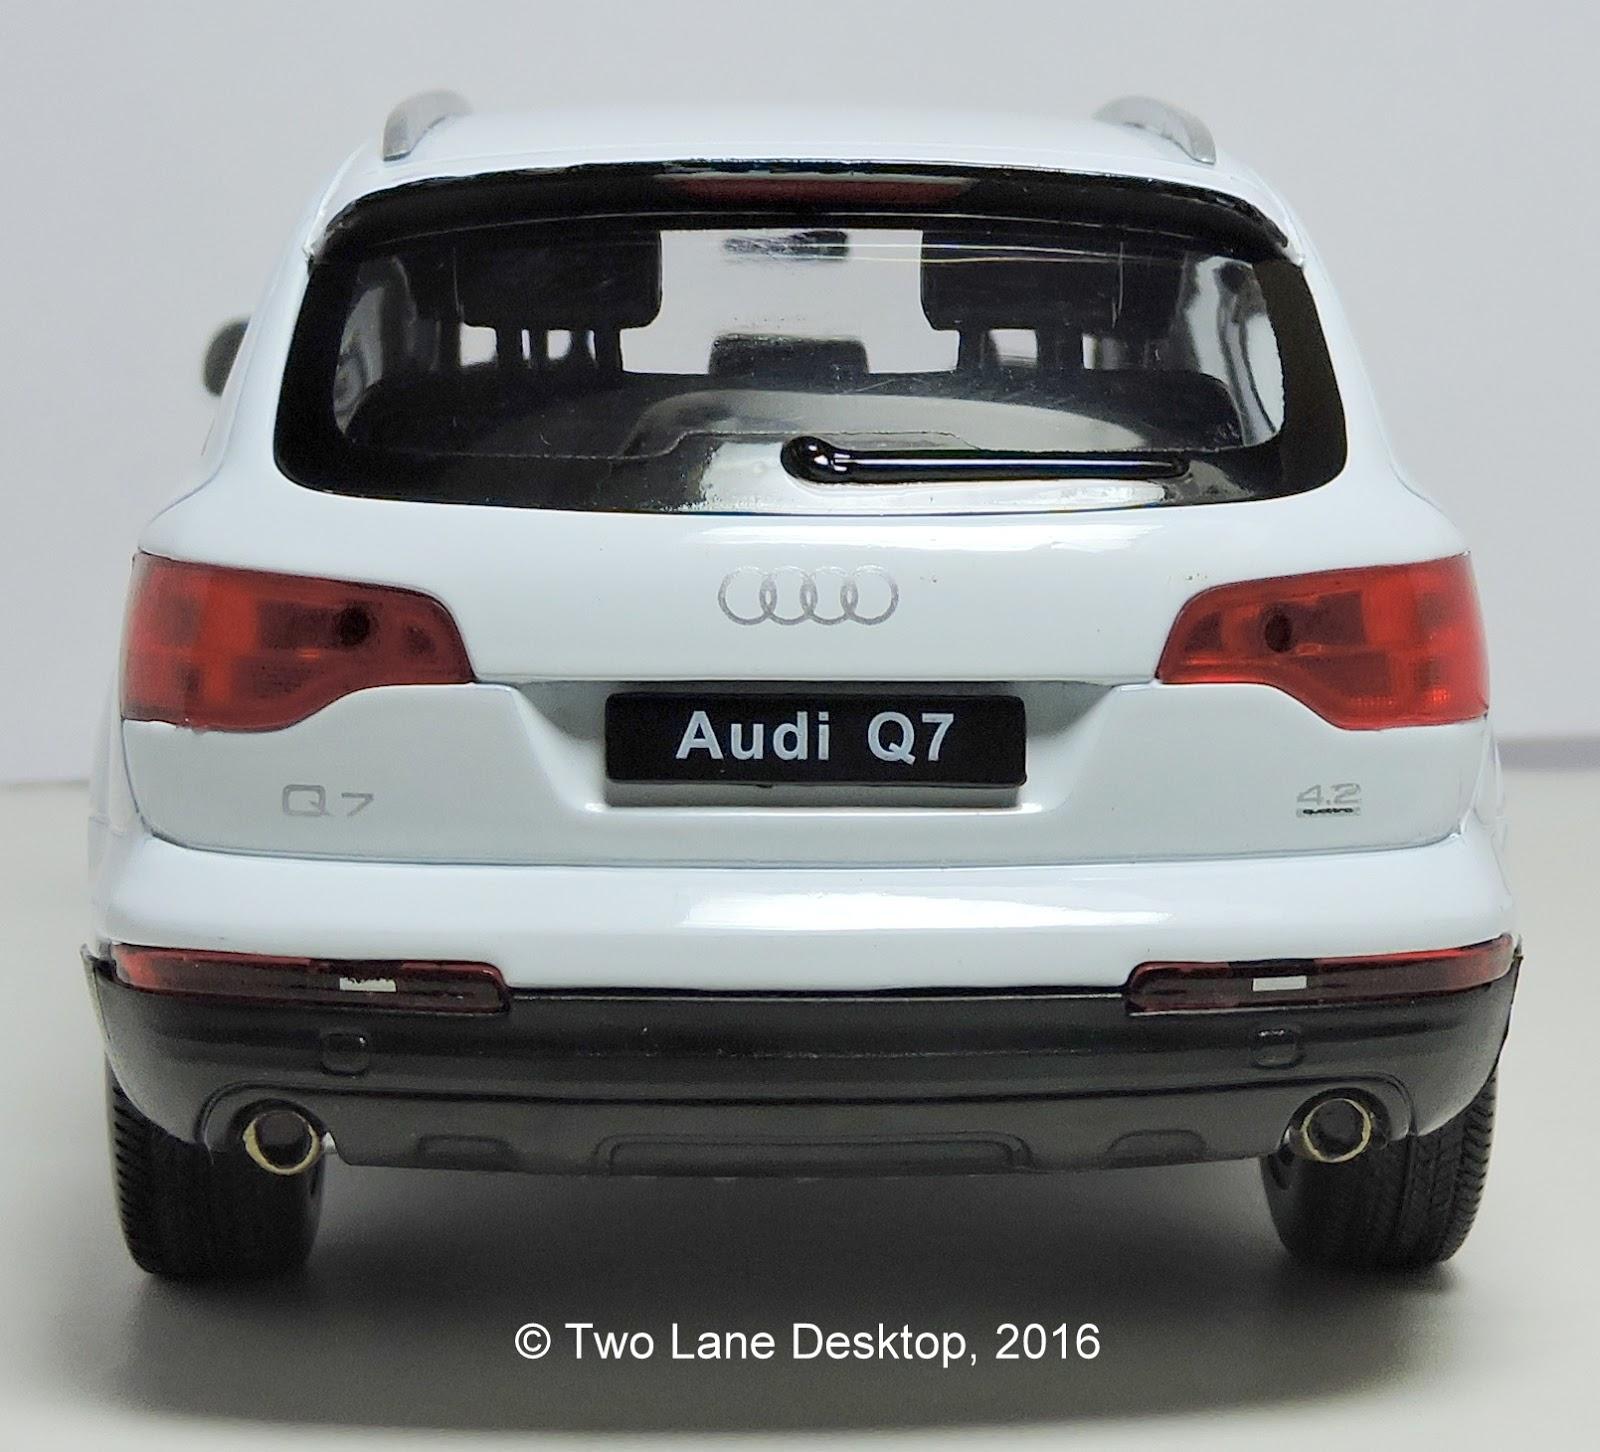 Two Lane Desktop: Welly 1:24 Audi's Part 3: 2005 Audi Q7 SUV